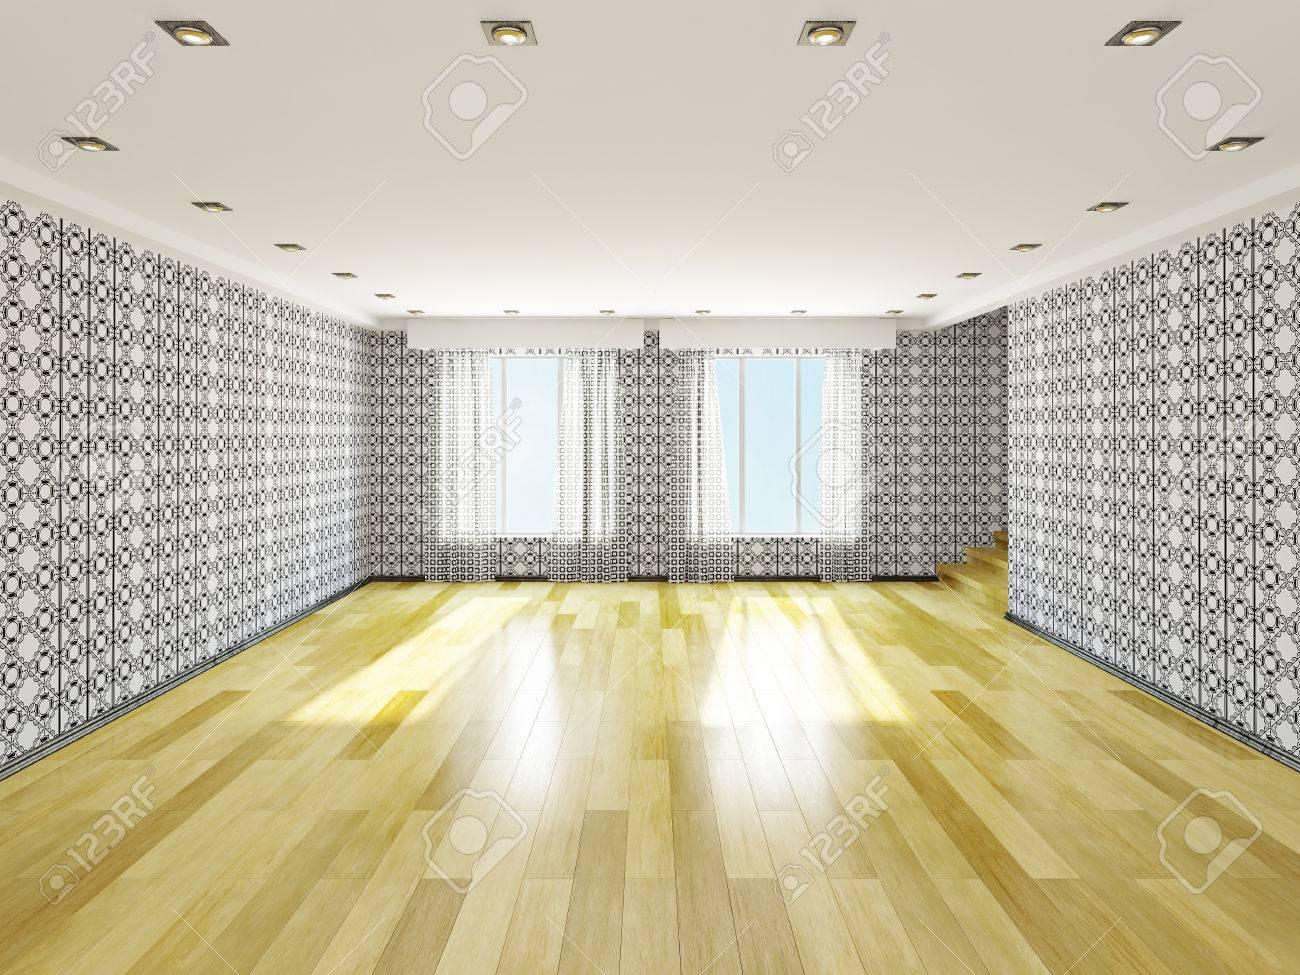 The big empty room with windows Stock Photo - 22989645